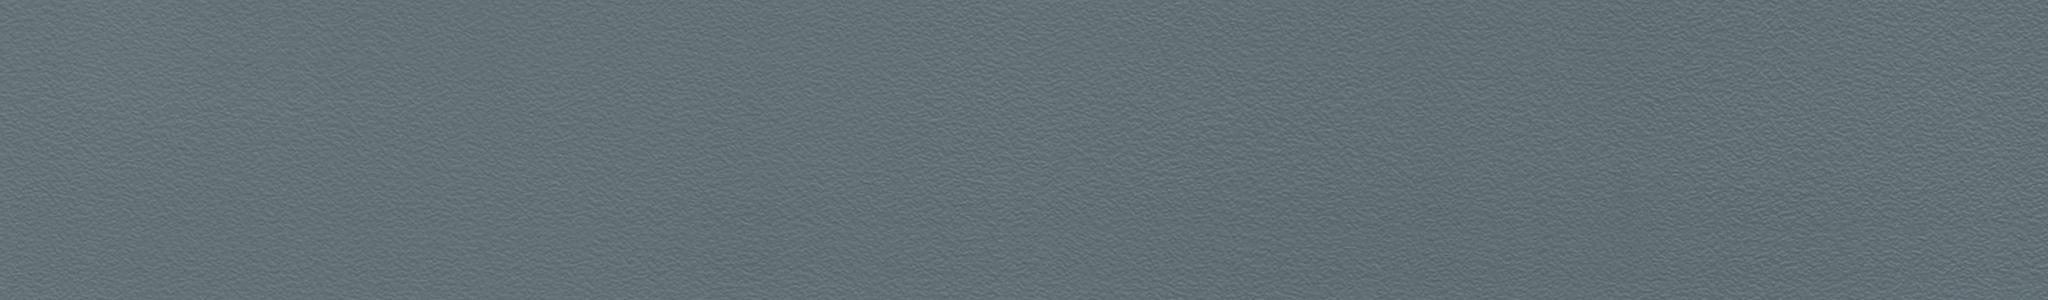 HU 169501 ABS hrana zelená fjord perla XG